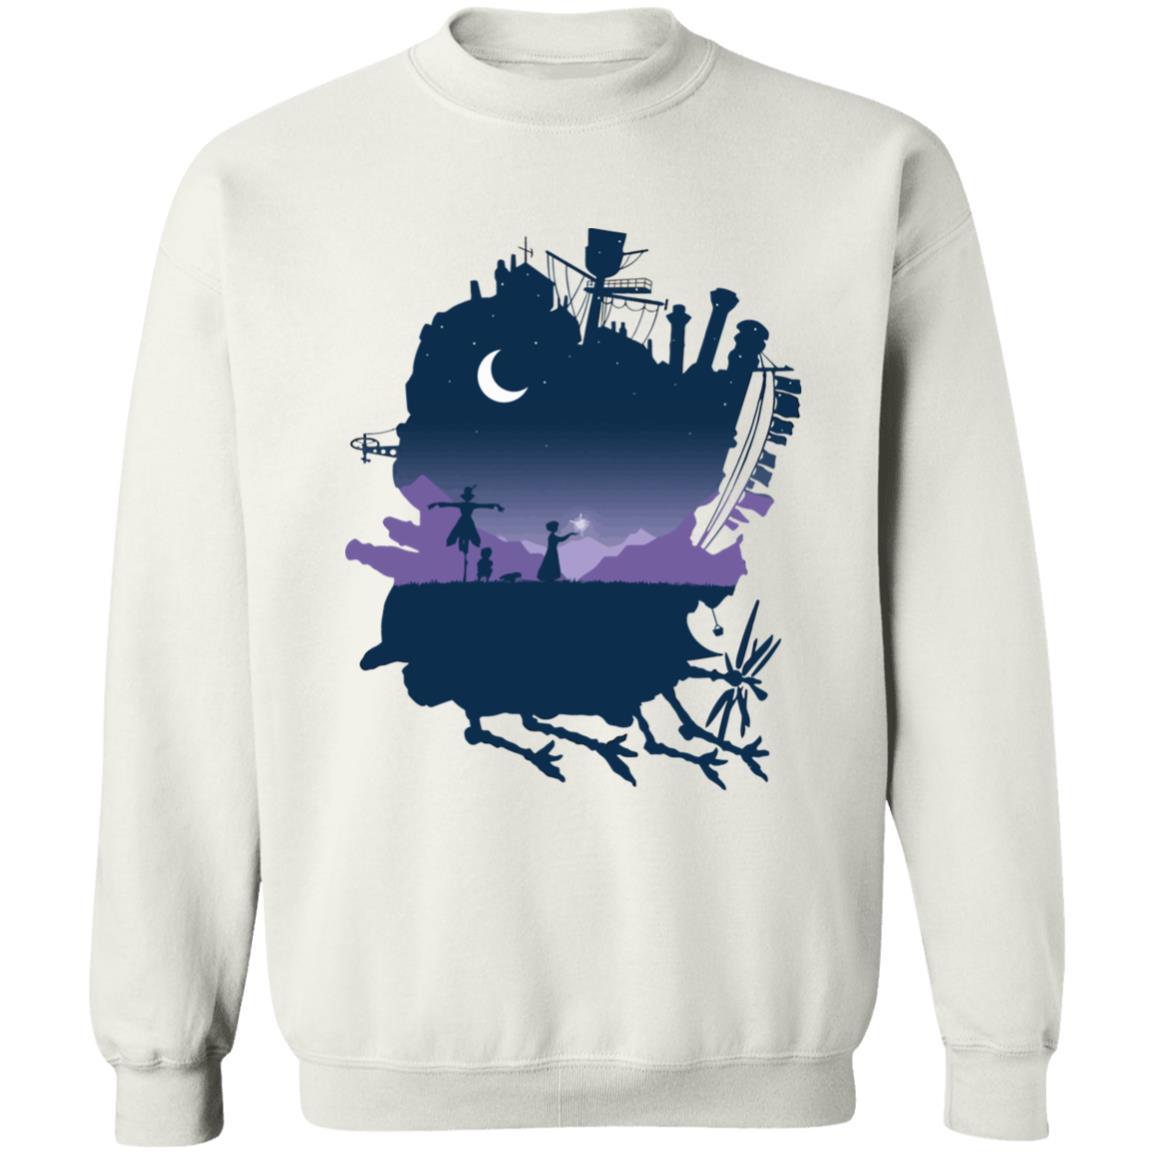 Howl's Moving Castle Midnight Sweatshirt